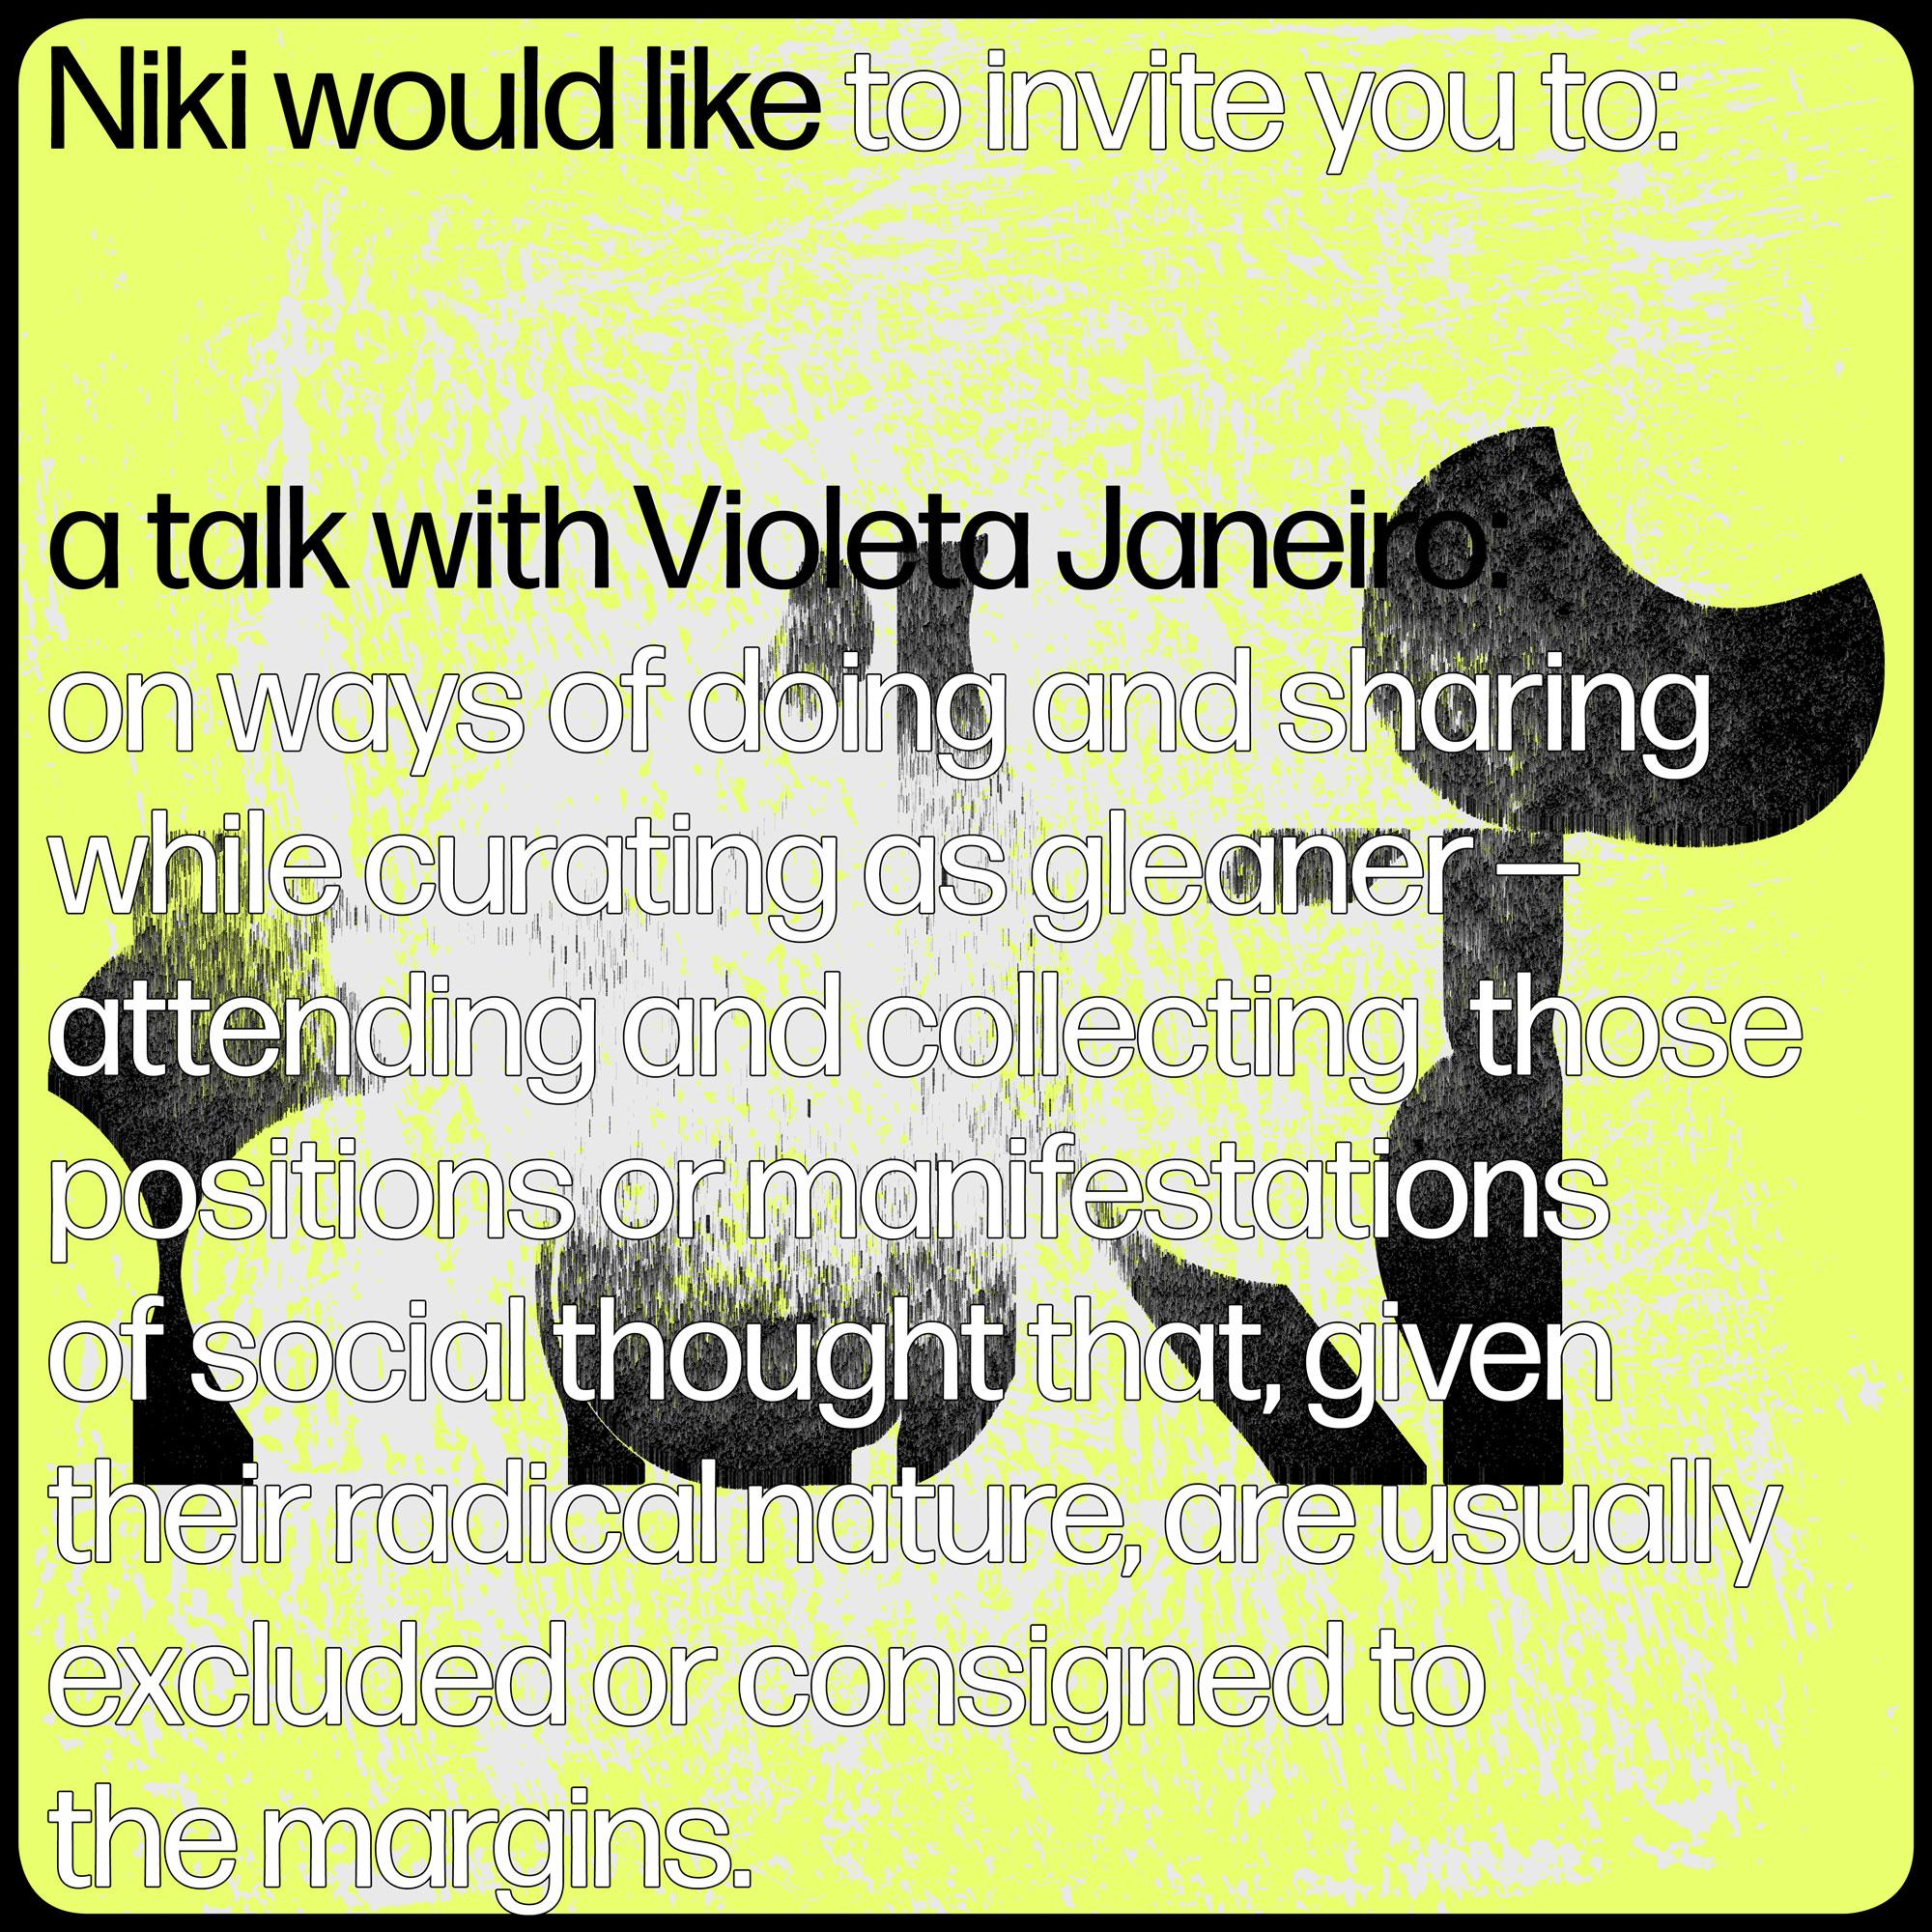 191105_niki_VioletaJaneiro_2_Tiles2_web